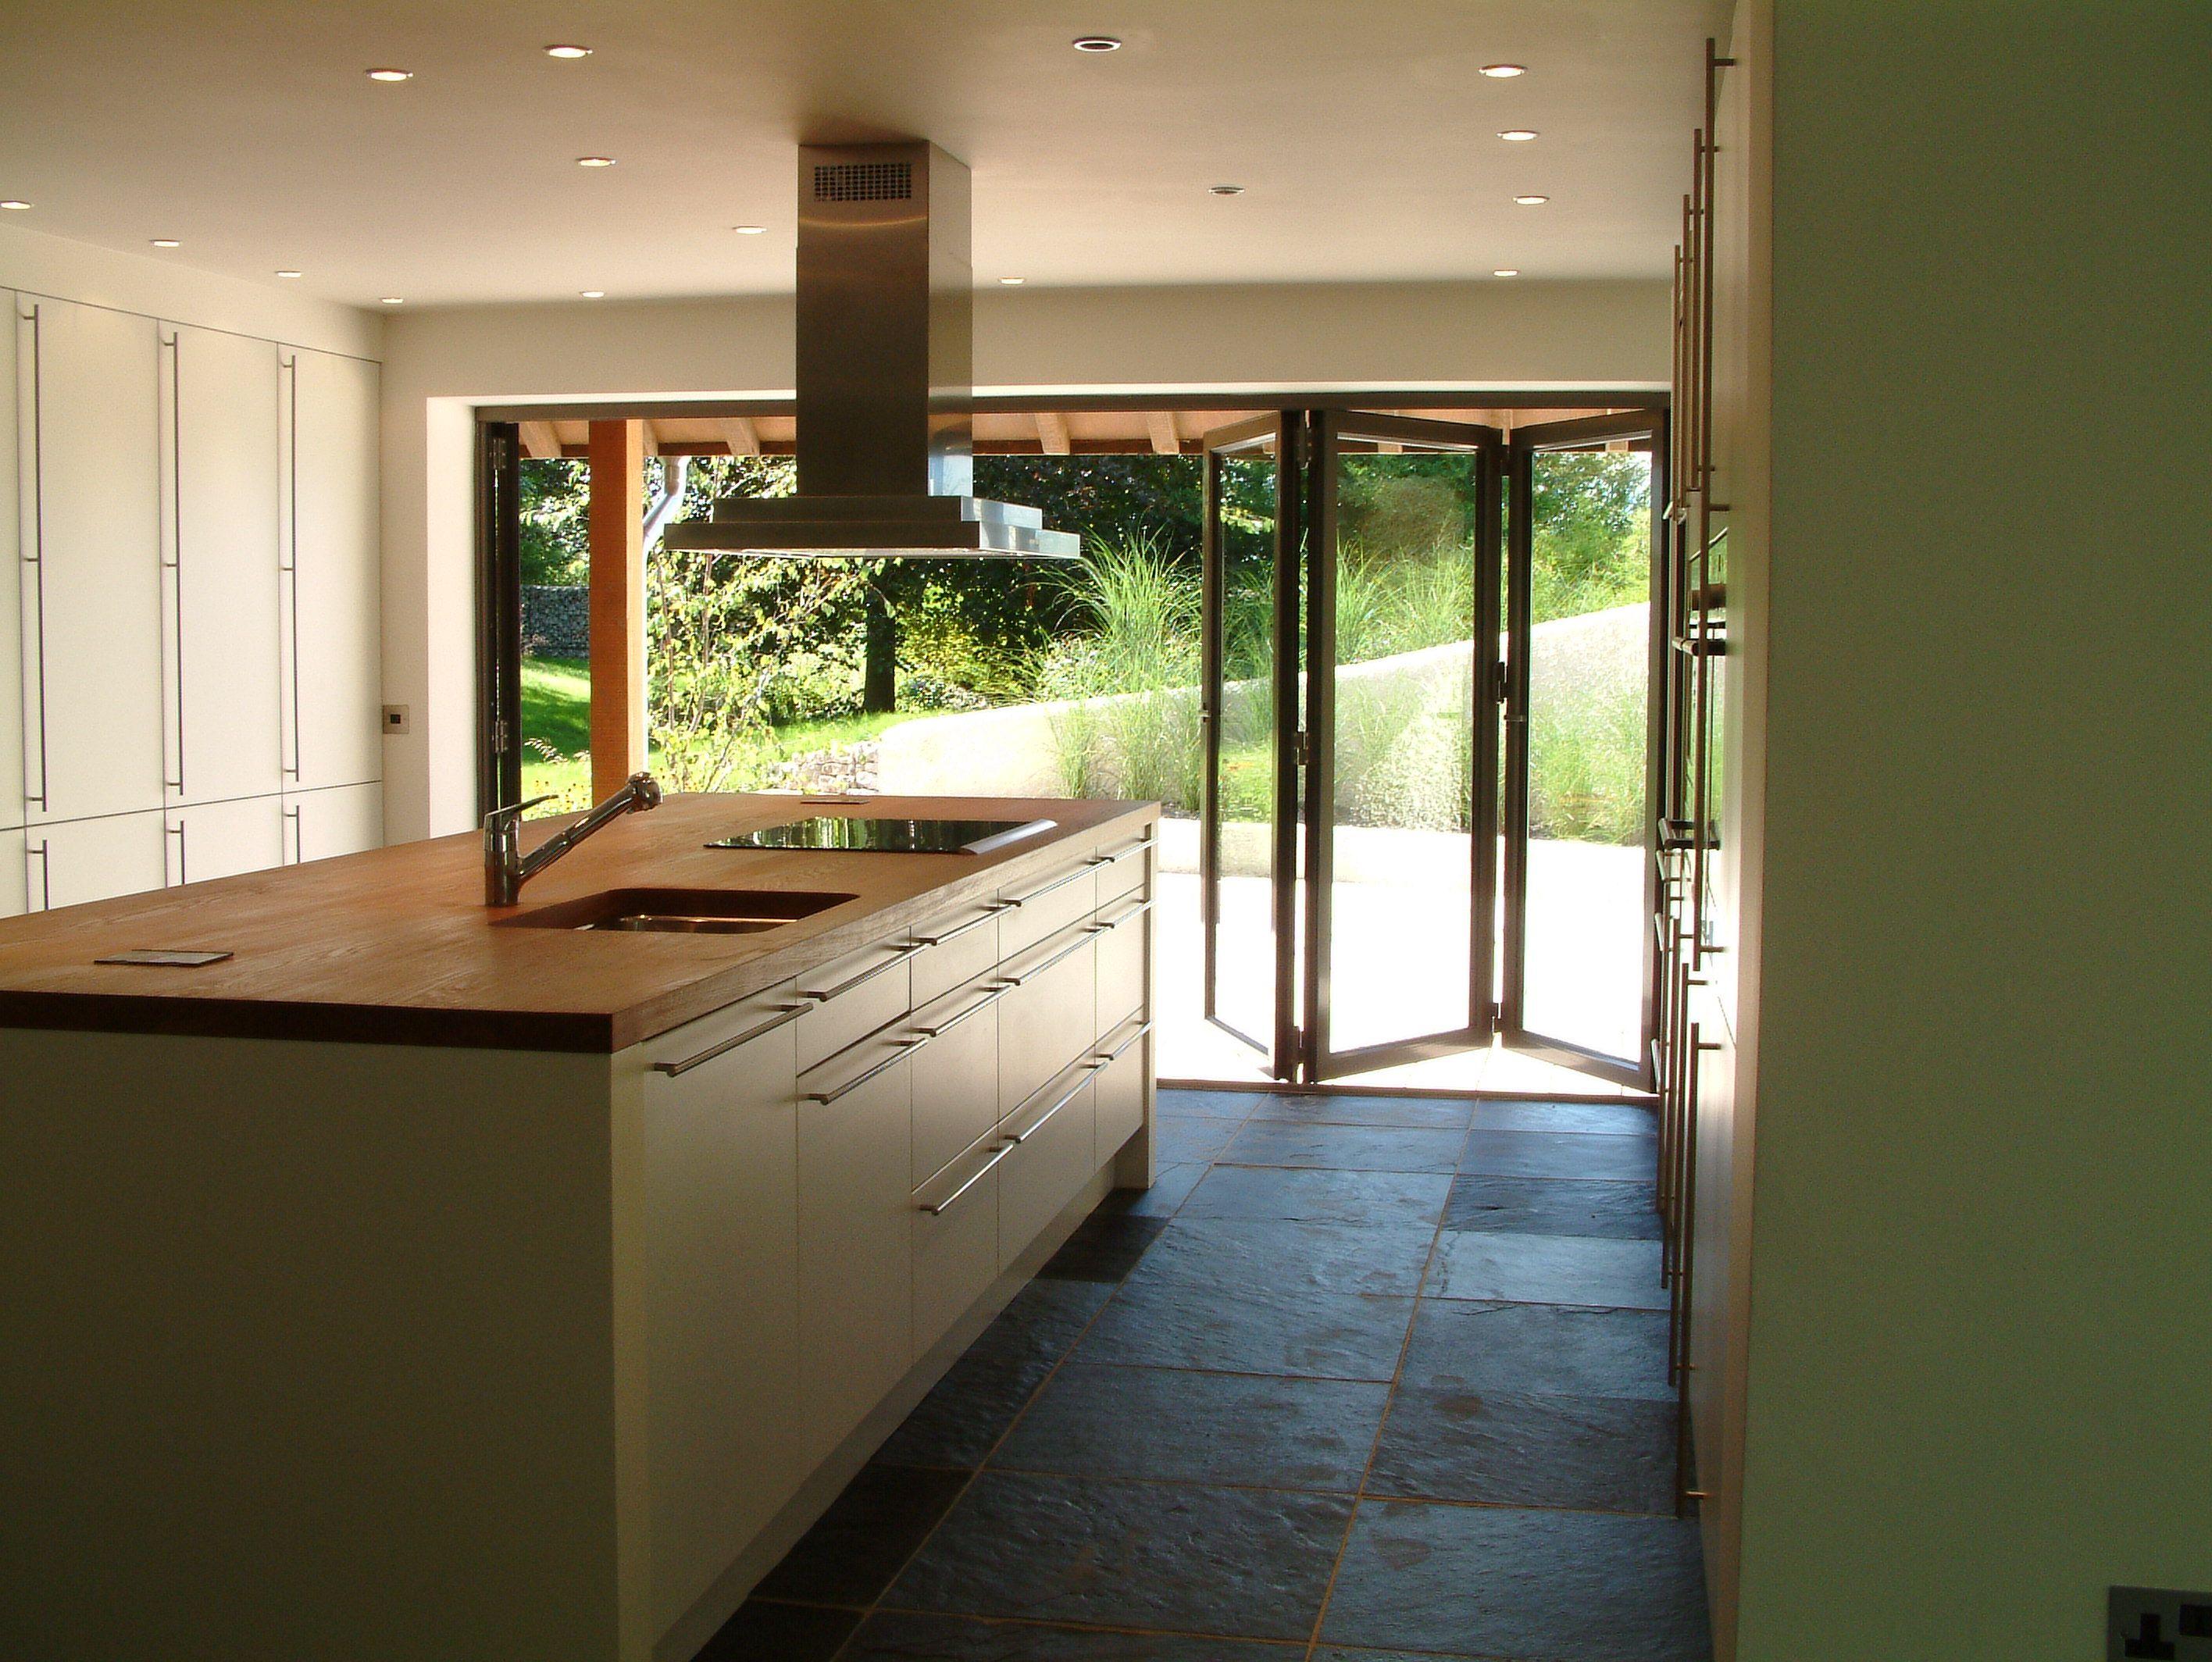 Bifolding Doors To Open Into The Backyard House Home